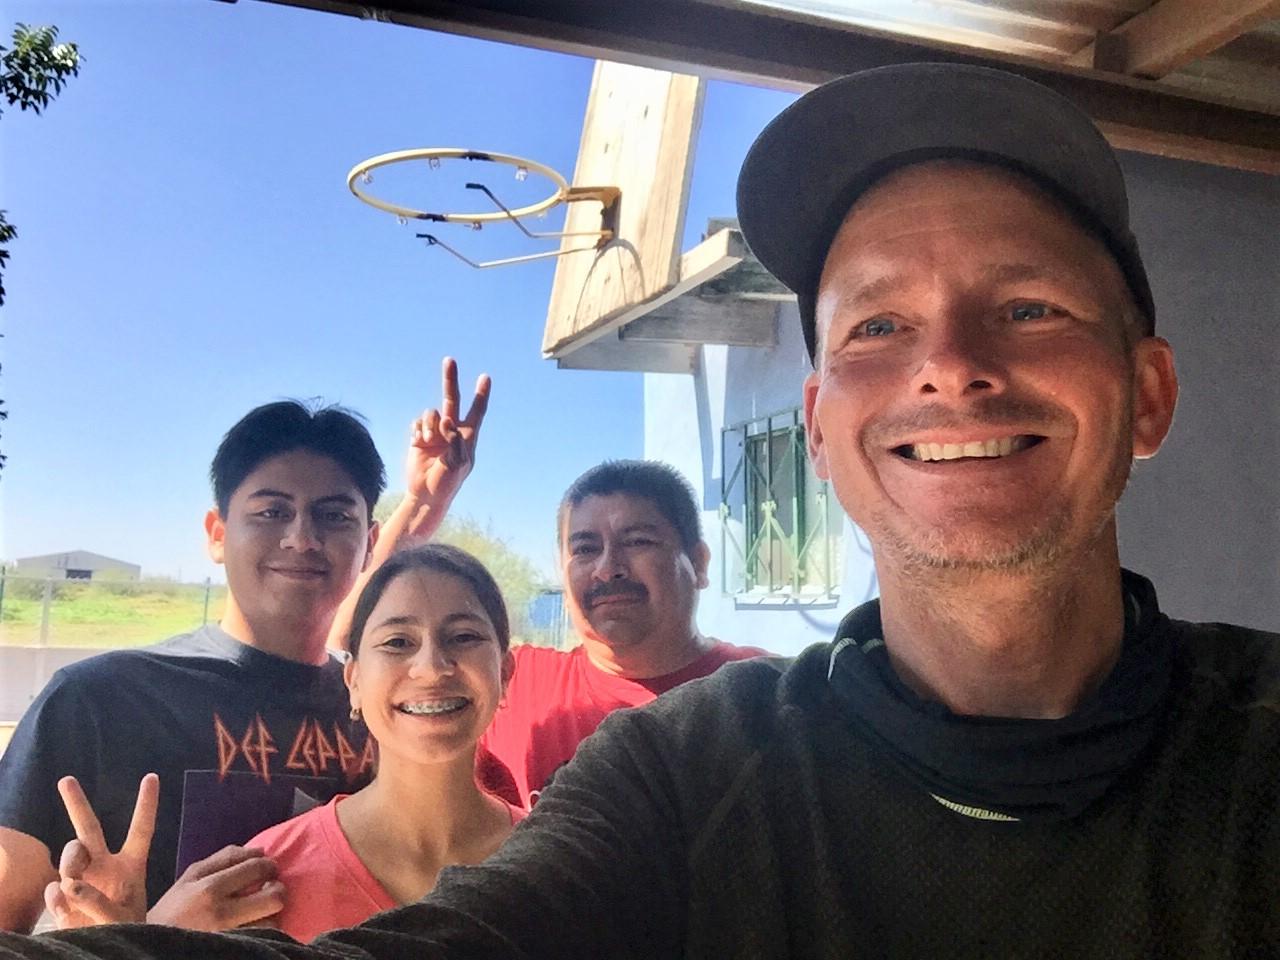 Raul Recio and his family